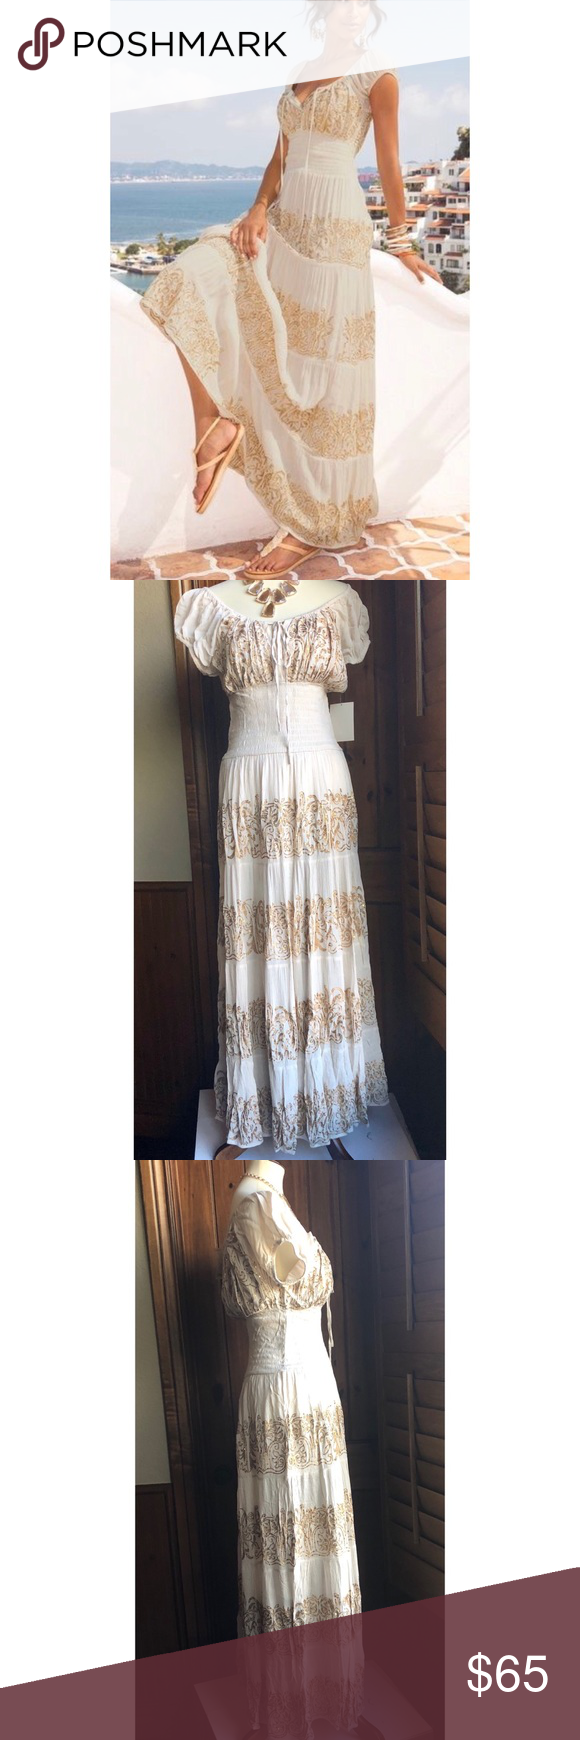 Boston Proper Sequin Peasant Dress Sz M Nwt Maxi Boston Proper Dresses Peasant Dress Clothes Design [ 1740 x 580 Pixel ]